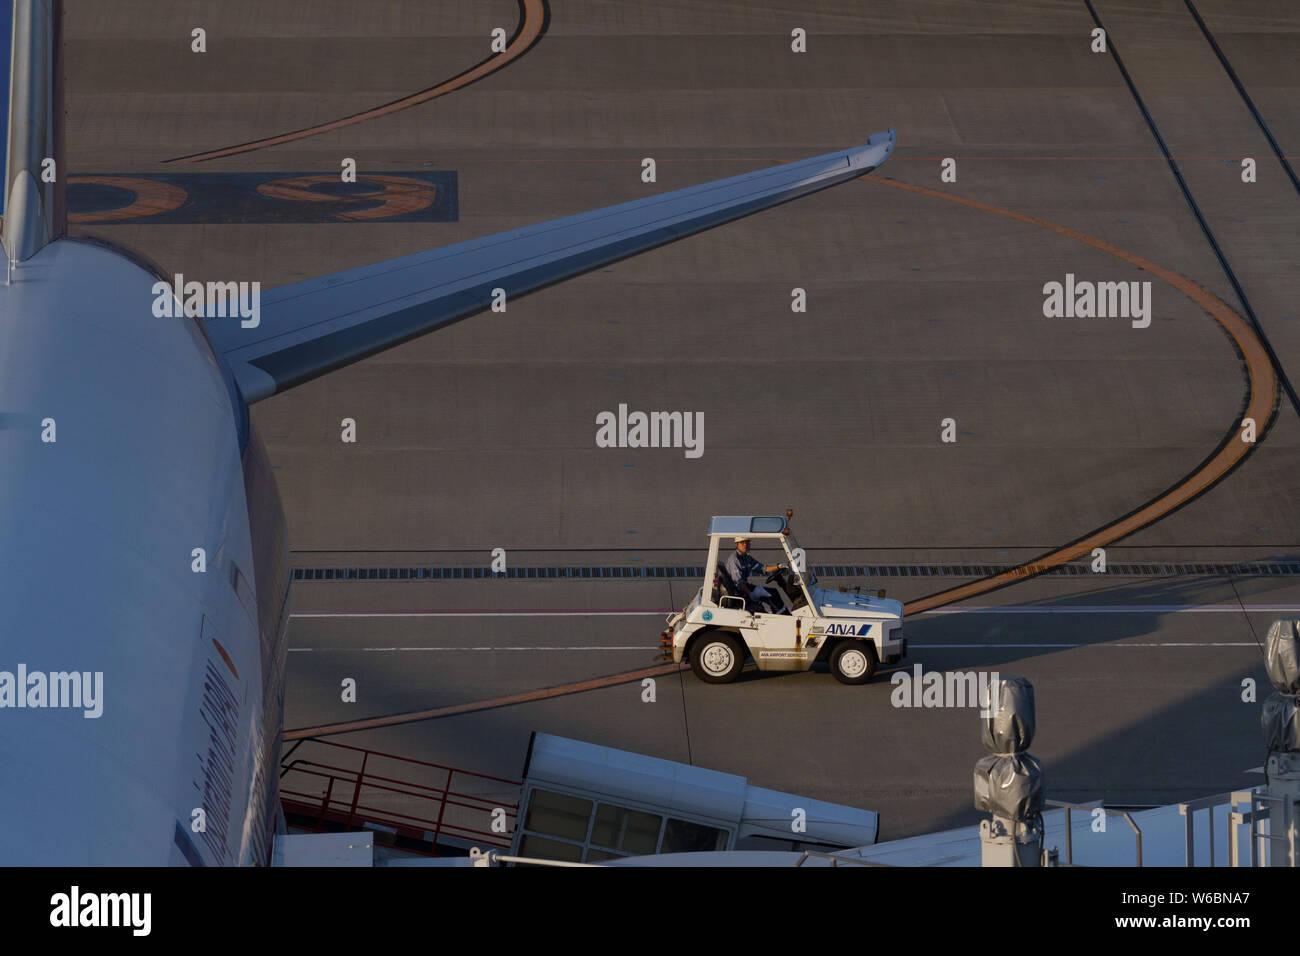 Airport Ground Staff Stock Photos & Airport Ground Staff